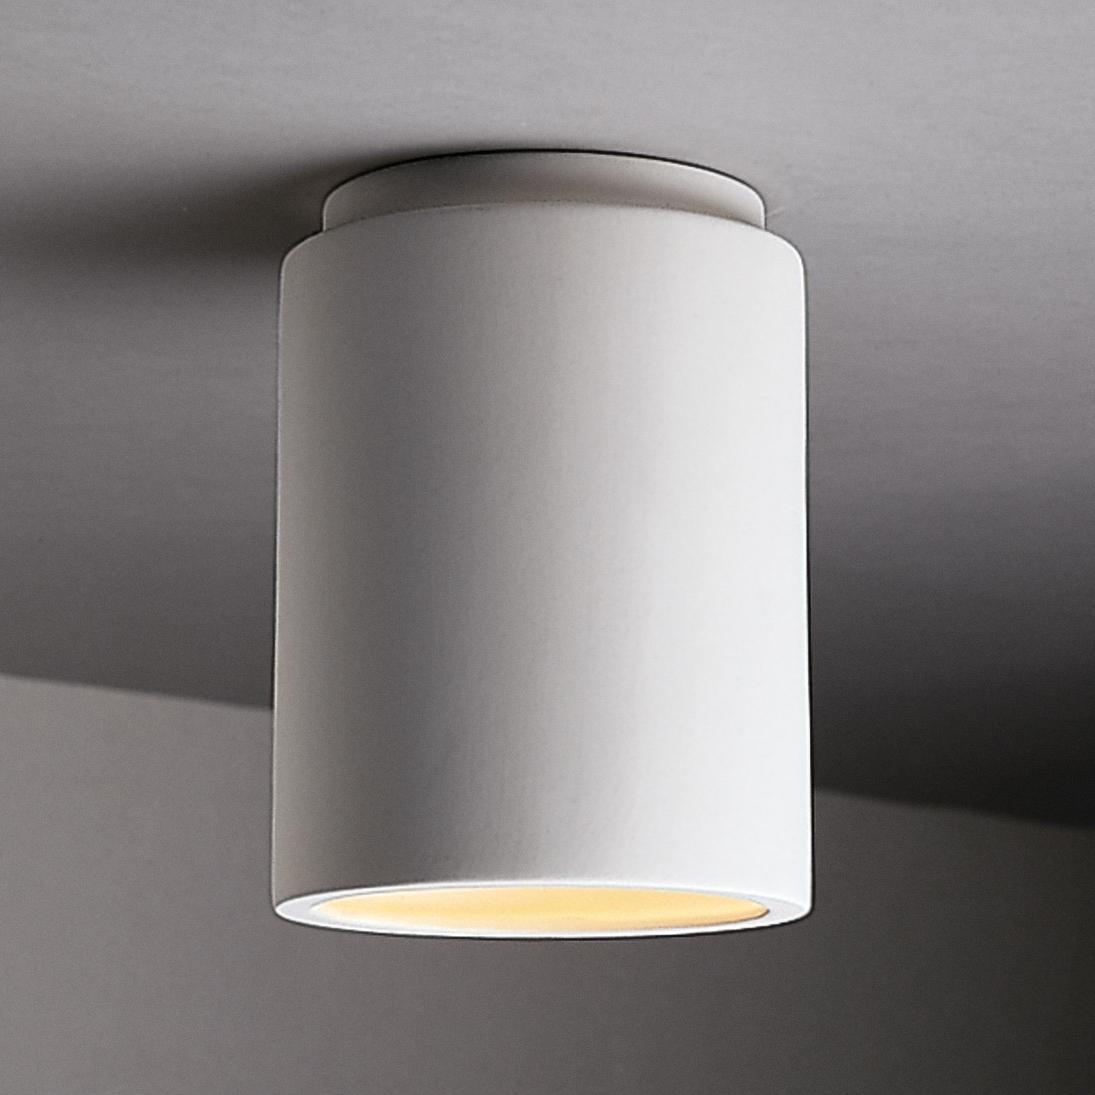 Design Cer 6100 Bis Radiance Cylinder Flush Mount Ceiling Fixture Regarding Most Current Modern Outdoor Ceiling Lights (Gallery 11 of 20)